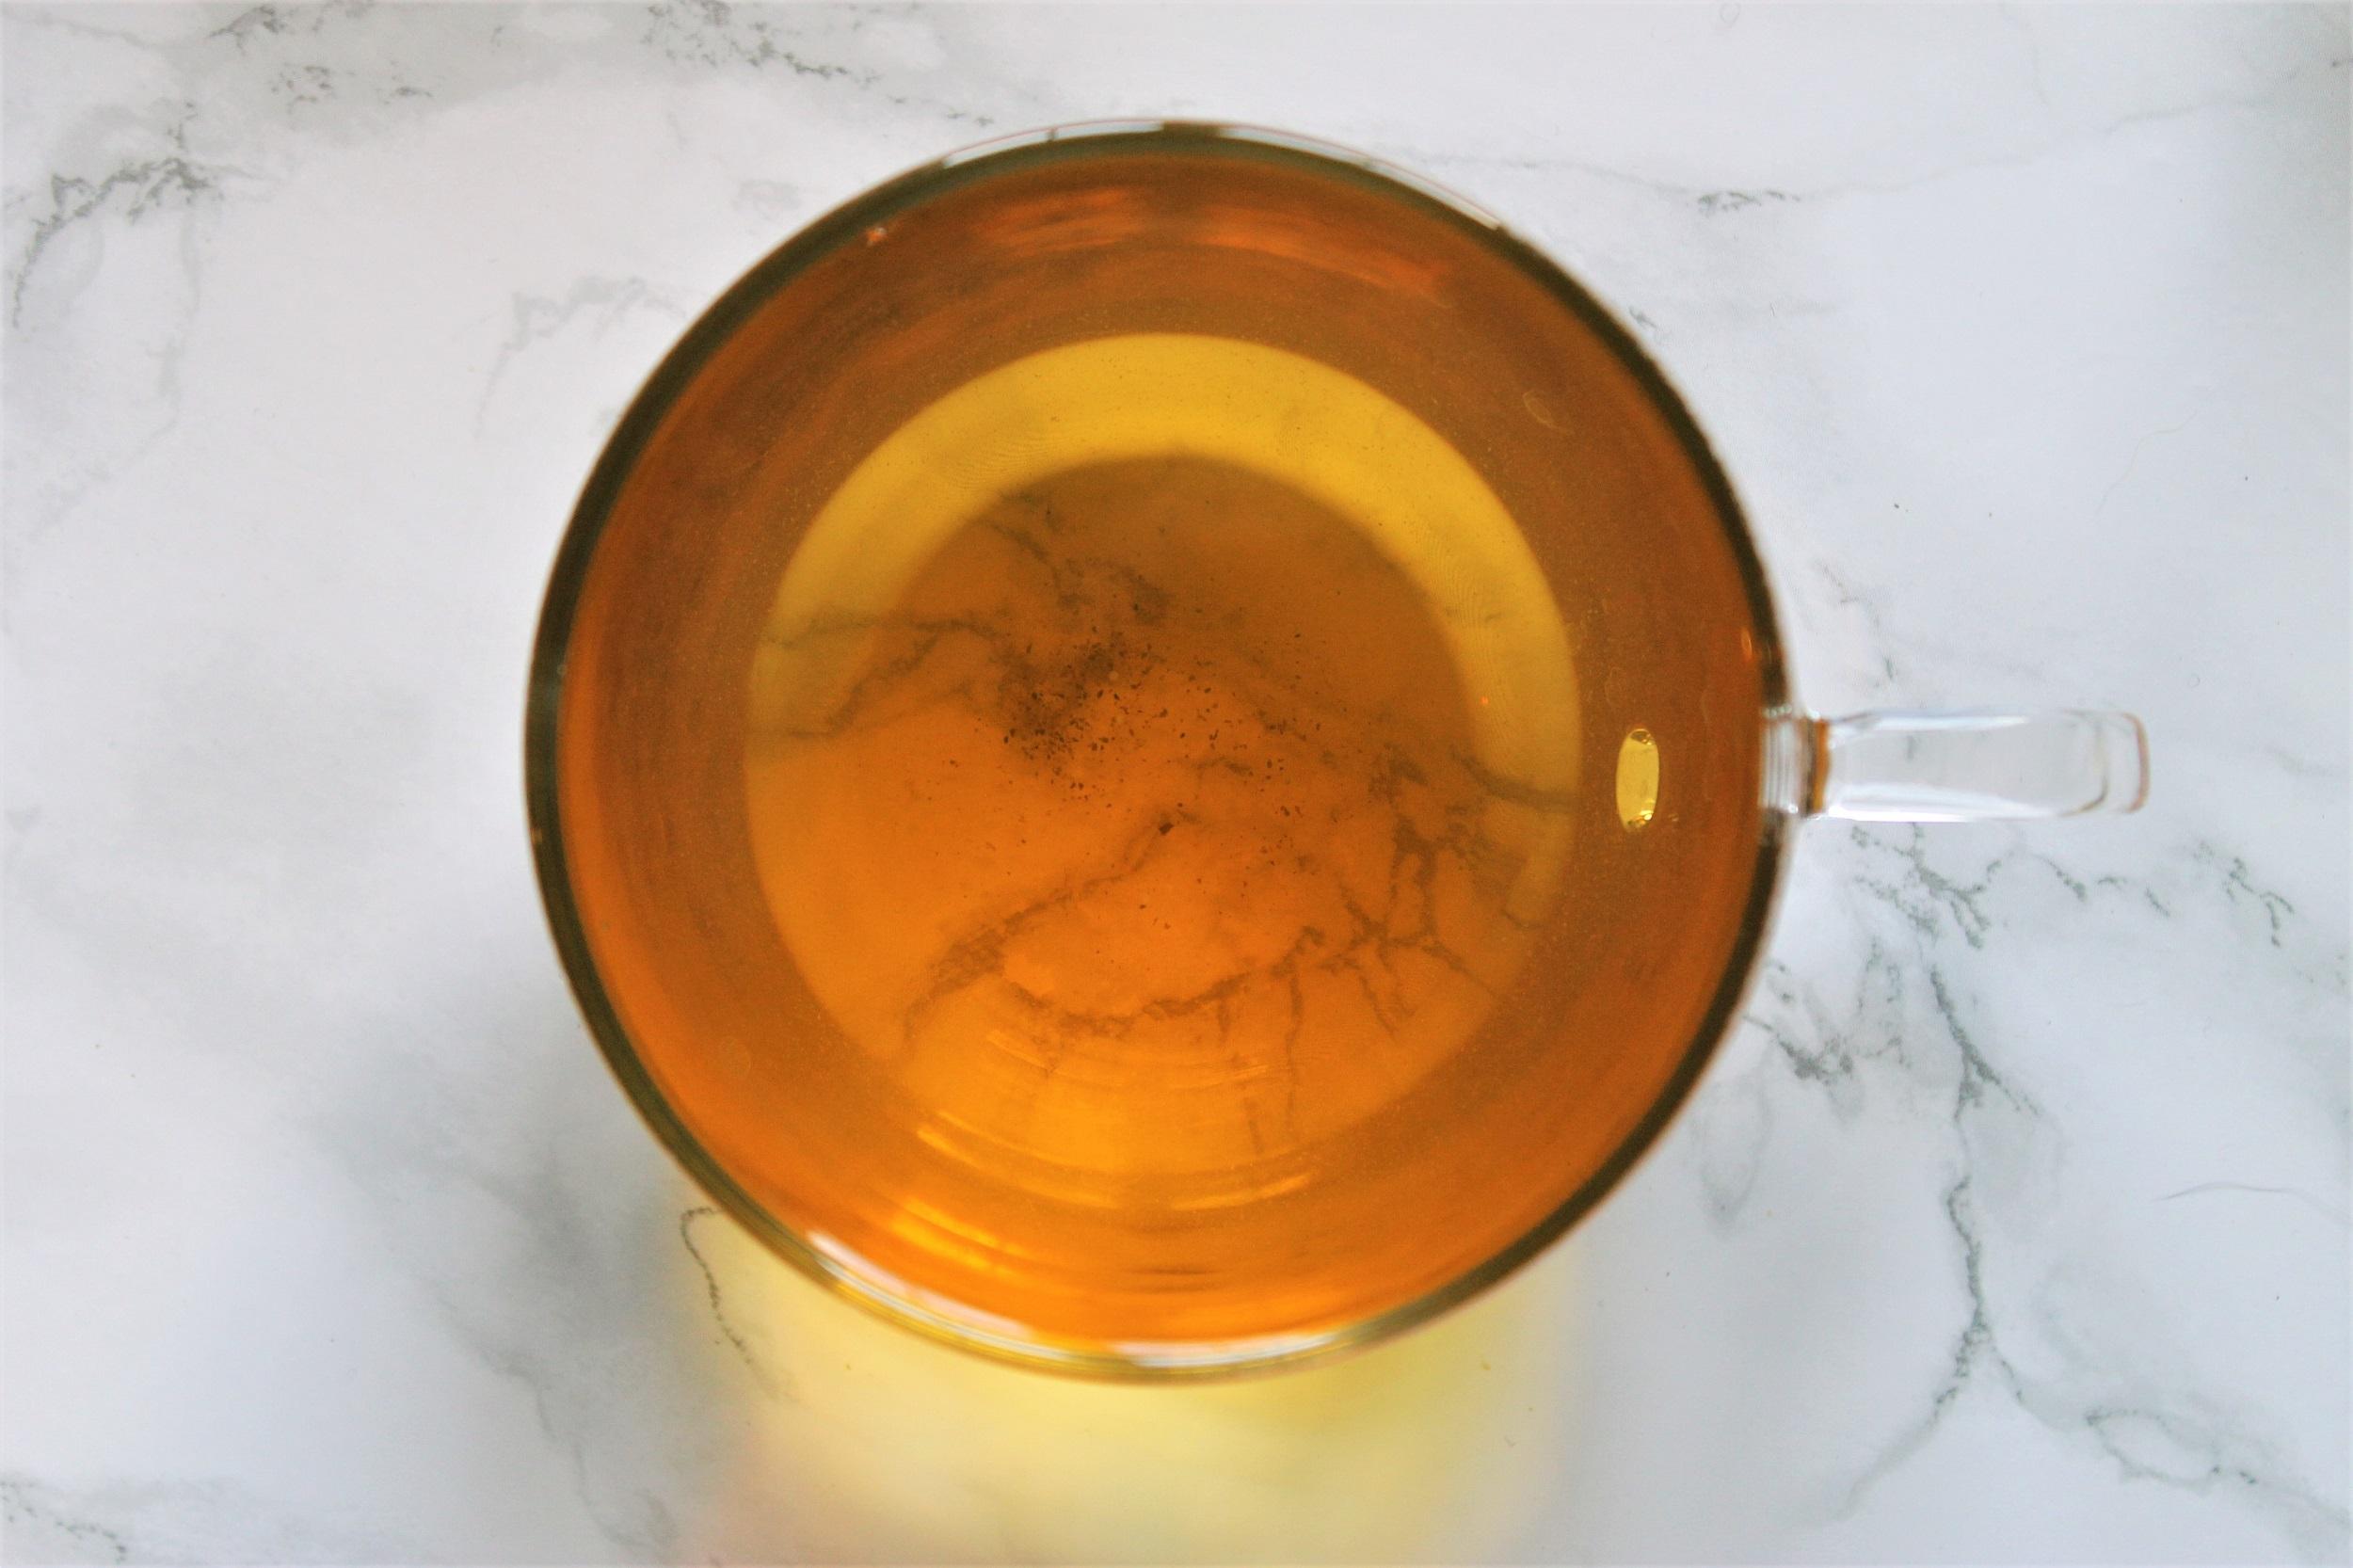 green tea with lemon glass teacup